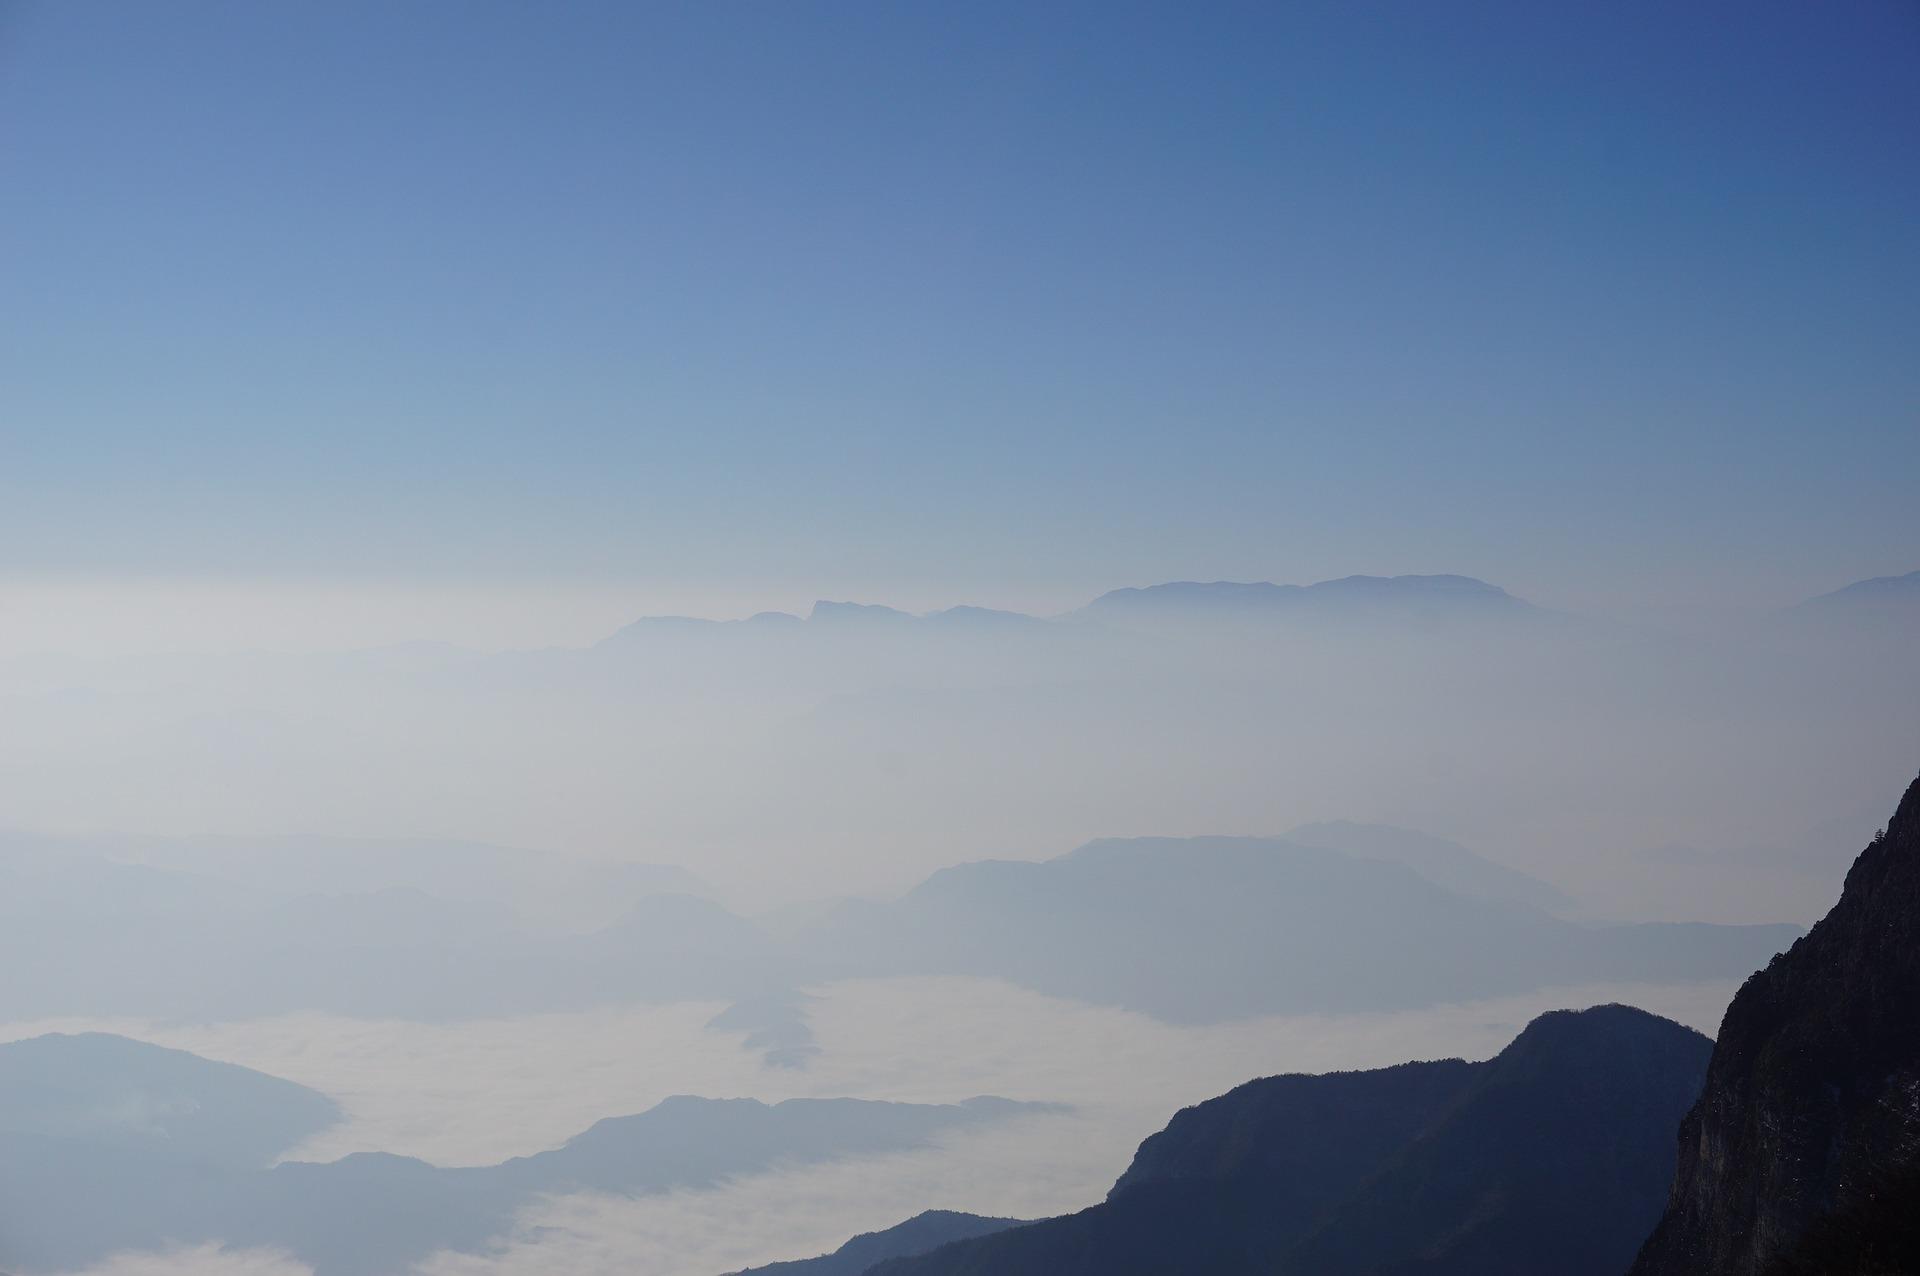 Monte Emei, China